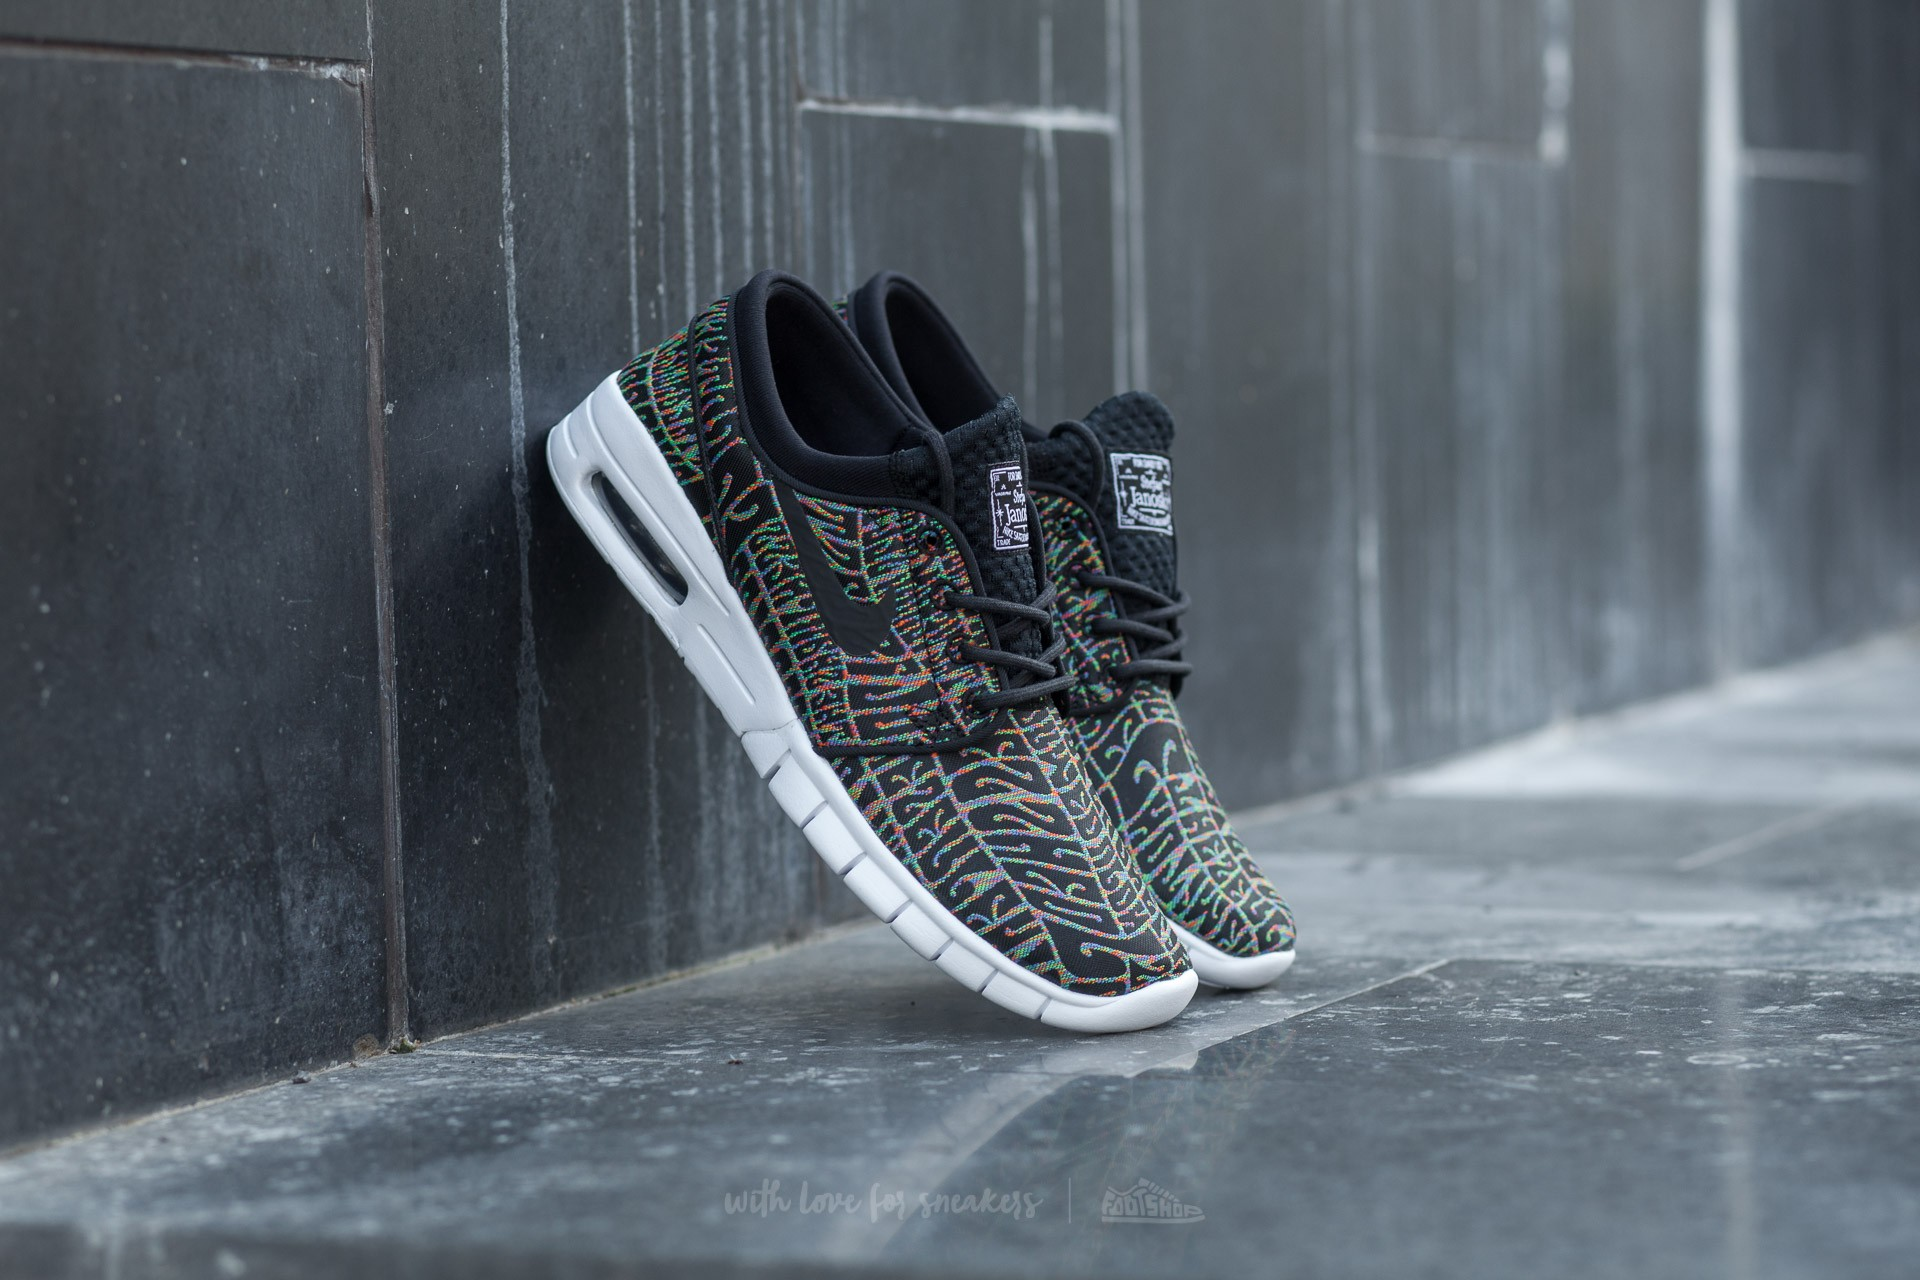 new products 0a6d0 b1a8d Nike Stefan Janoski Max Premium. Black  Black-White-Multi-Color